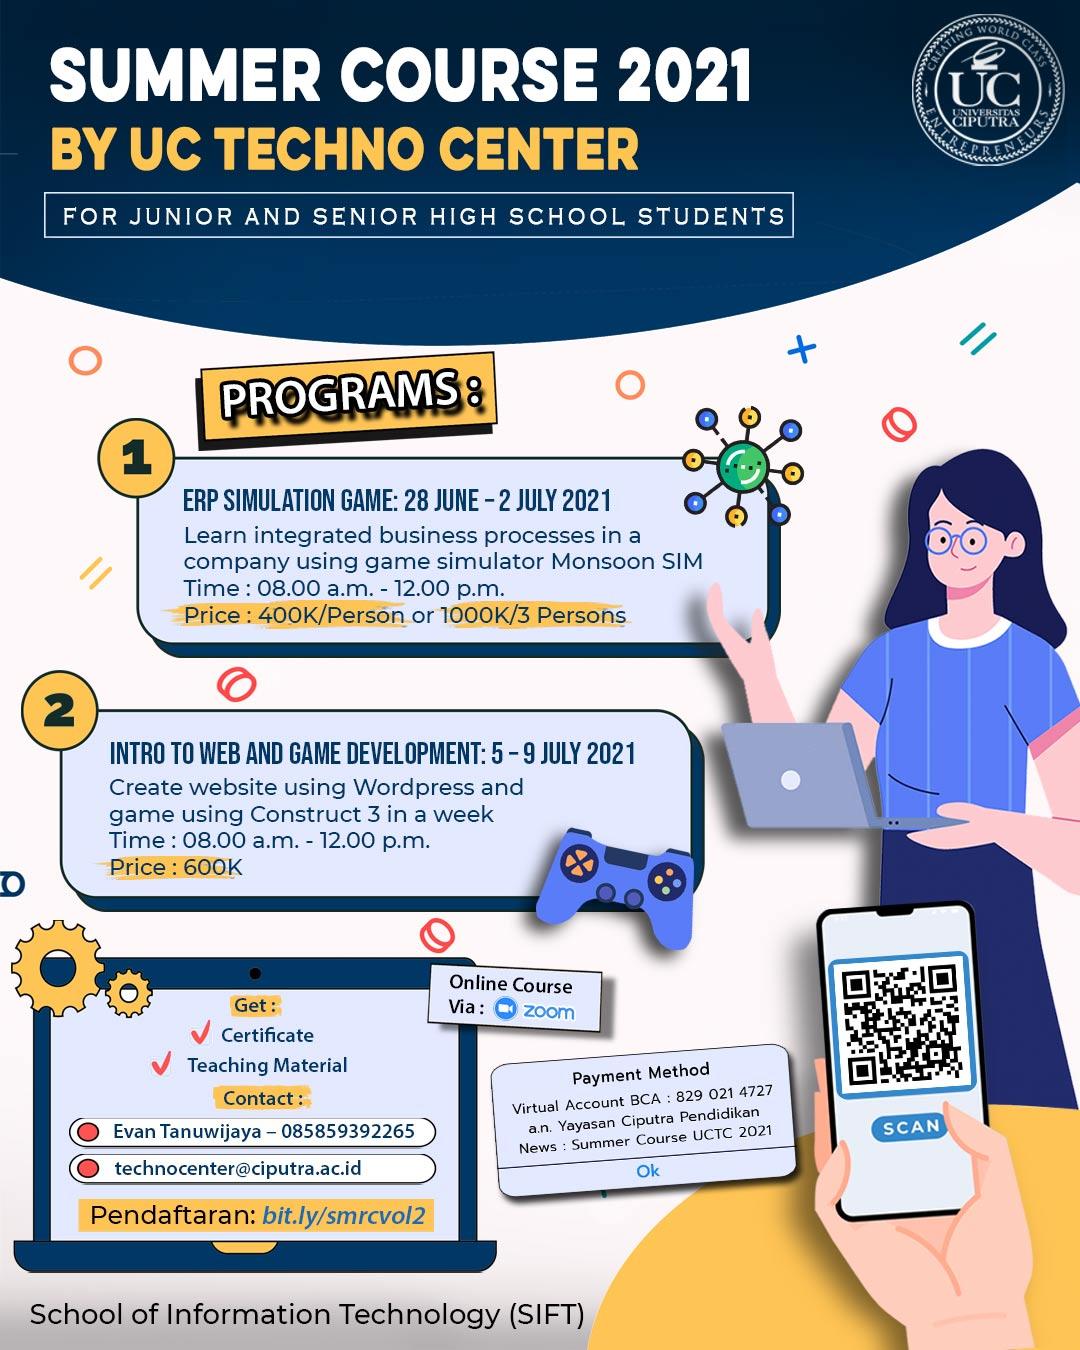 UC Techno Center Summer Course 2021